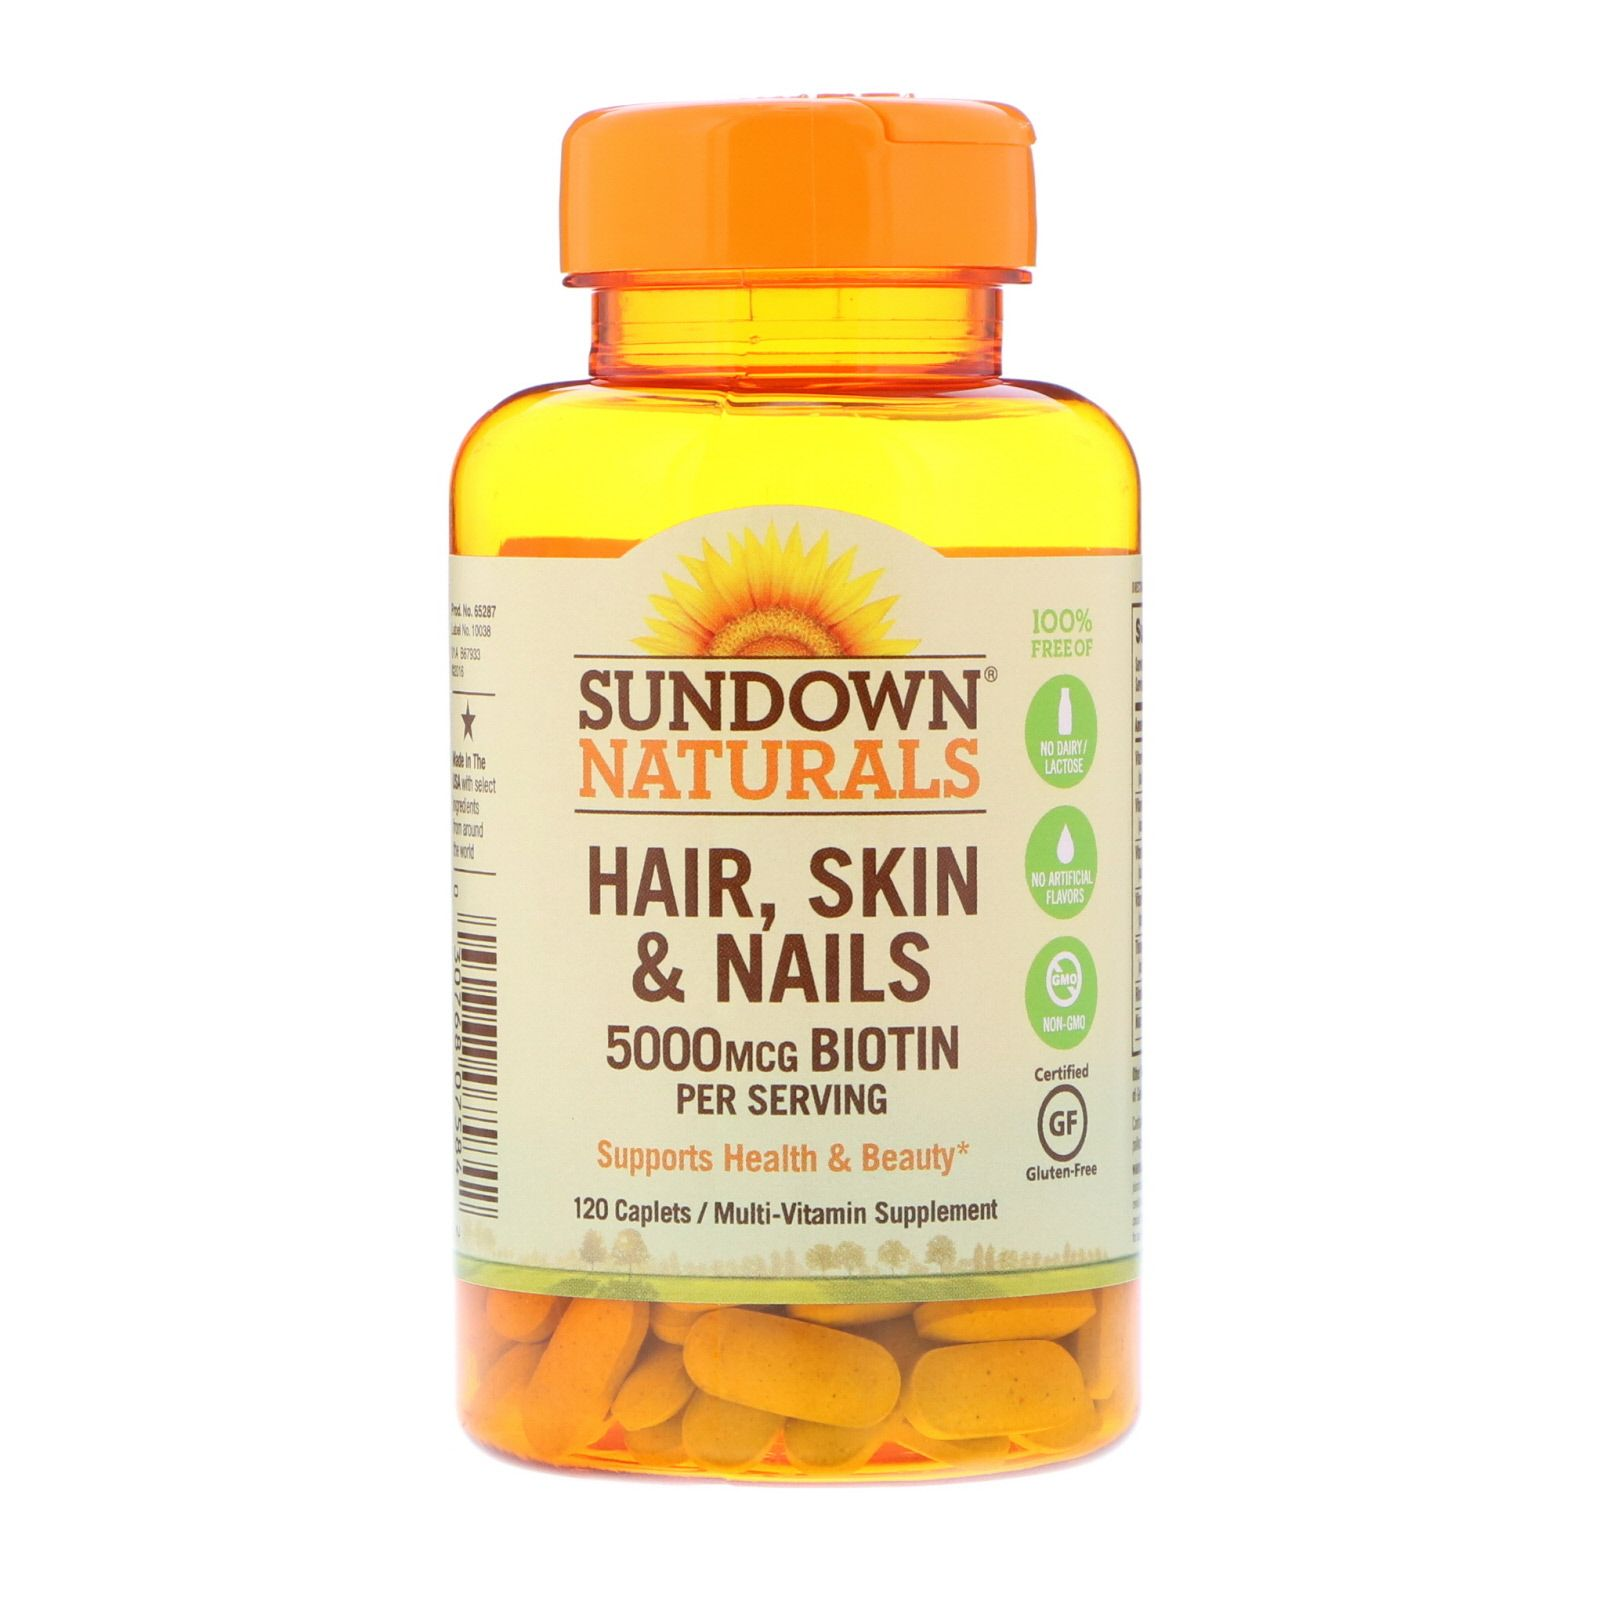 Sundown Naturals مكمل غذائي للشعر والبشرة والأظافر 120 كبسولة Natural Hair Styles Hair Skin Nails Health Beauty